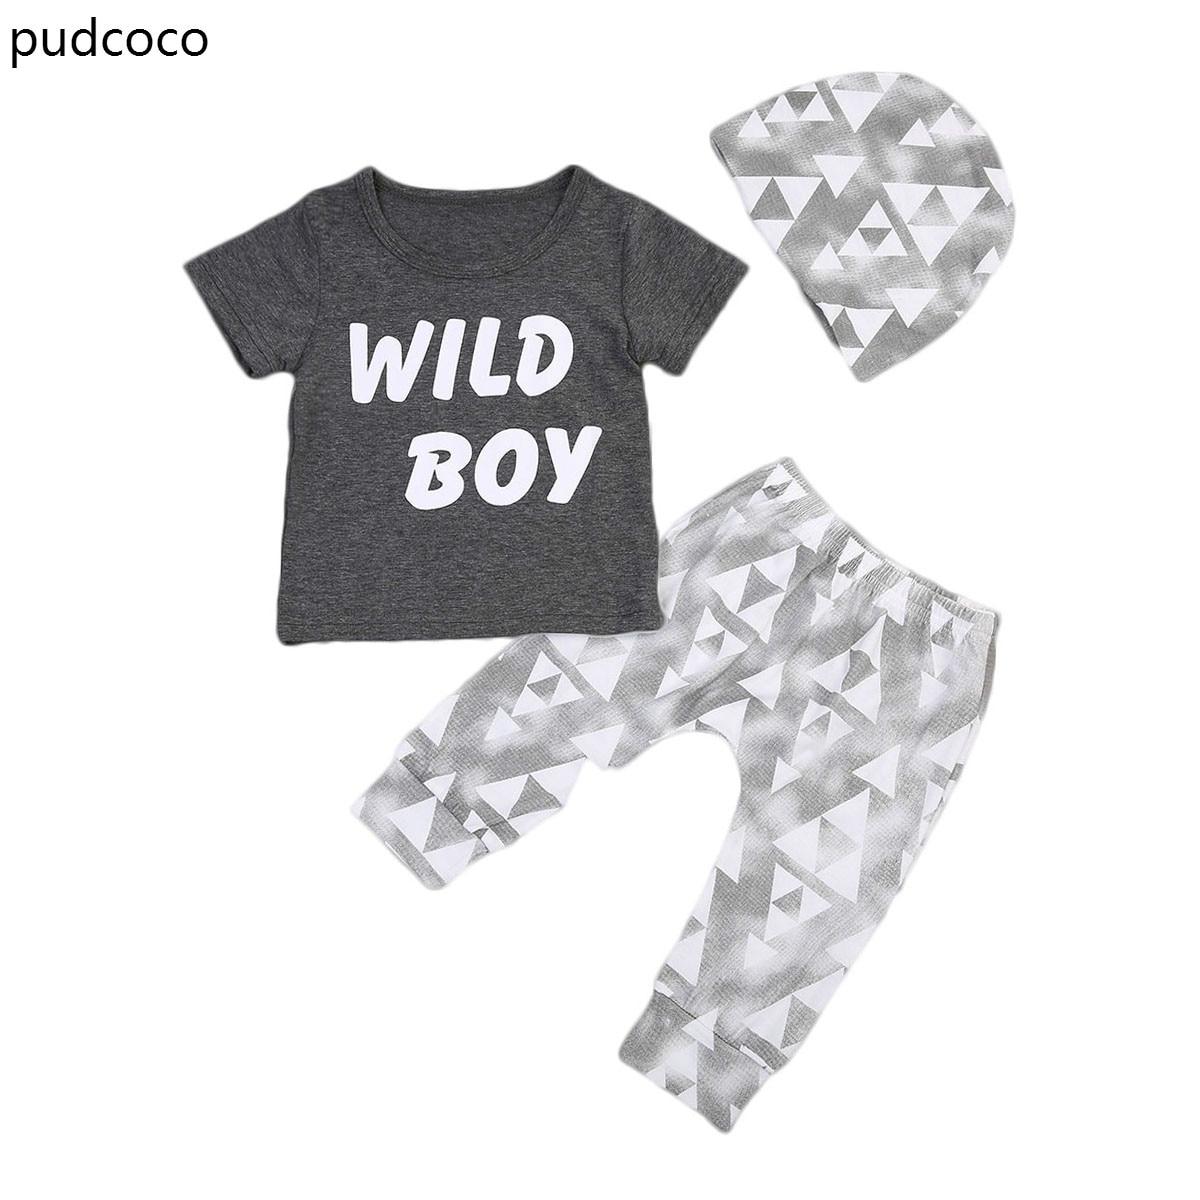 3pcs Kids Clothes Set Newborn Baby Boys Wild Boy Short Sleeve Tops T-shirt Pants Leggings Hats Outfits Children Clothing Sets